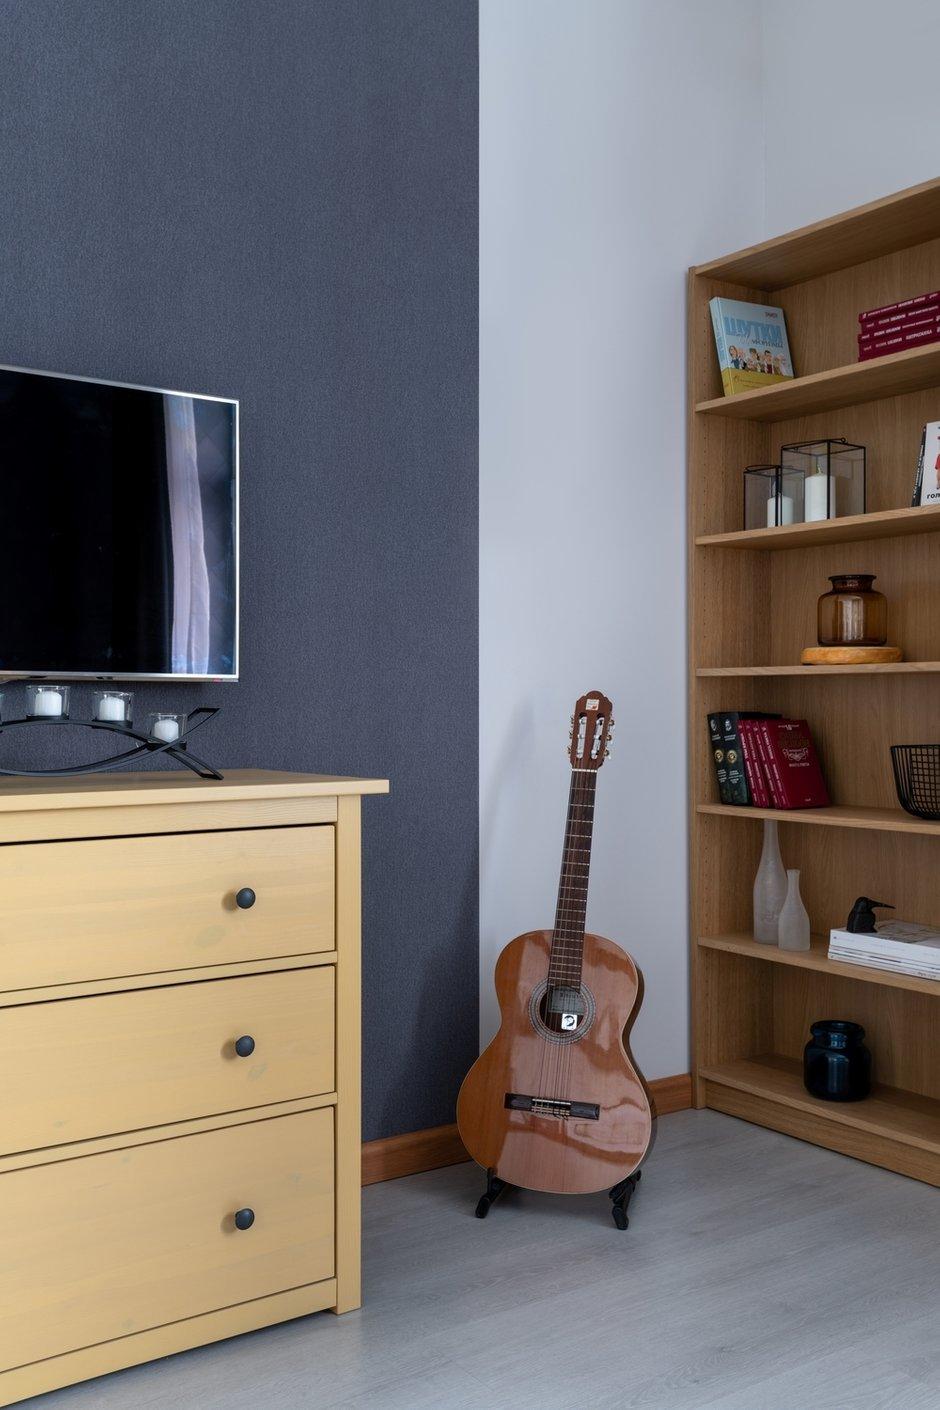 Фотография: Гостиная в стиле Современный, Малогабаритная квартира, Квартира, Проект недели, Москва, 1 комната, 40-60 метров, Светлана Краснова – фото на INMYROOM